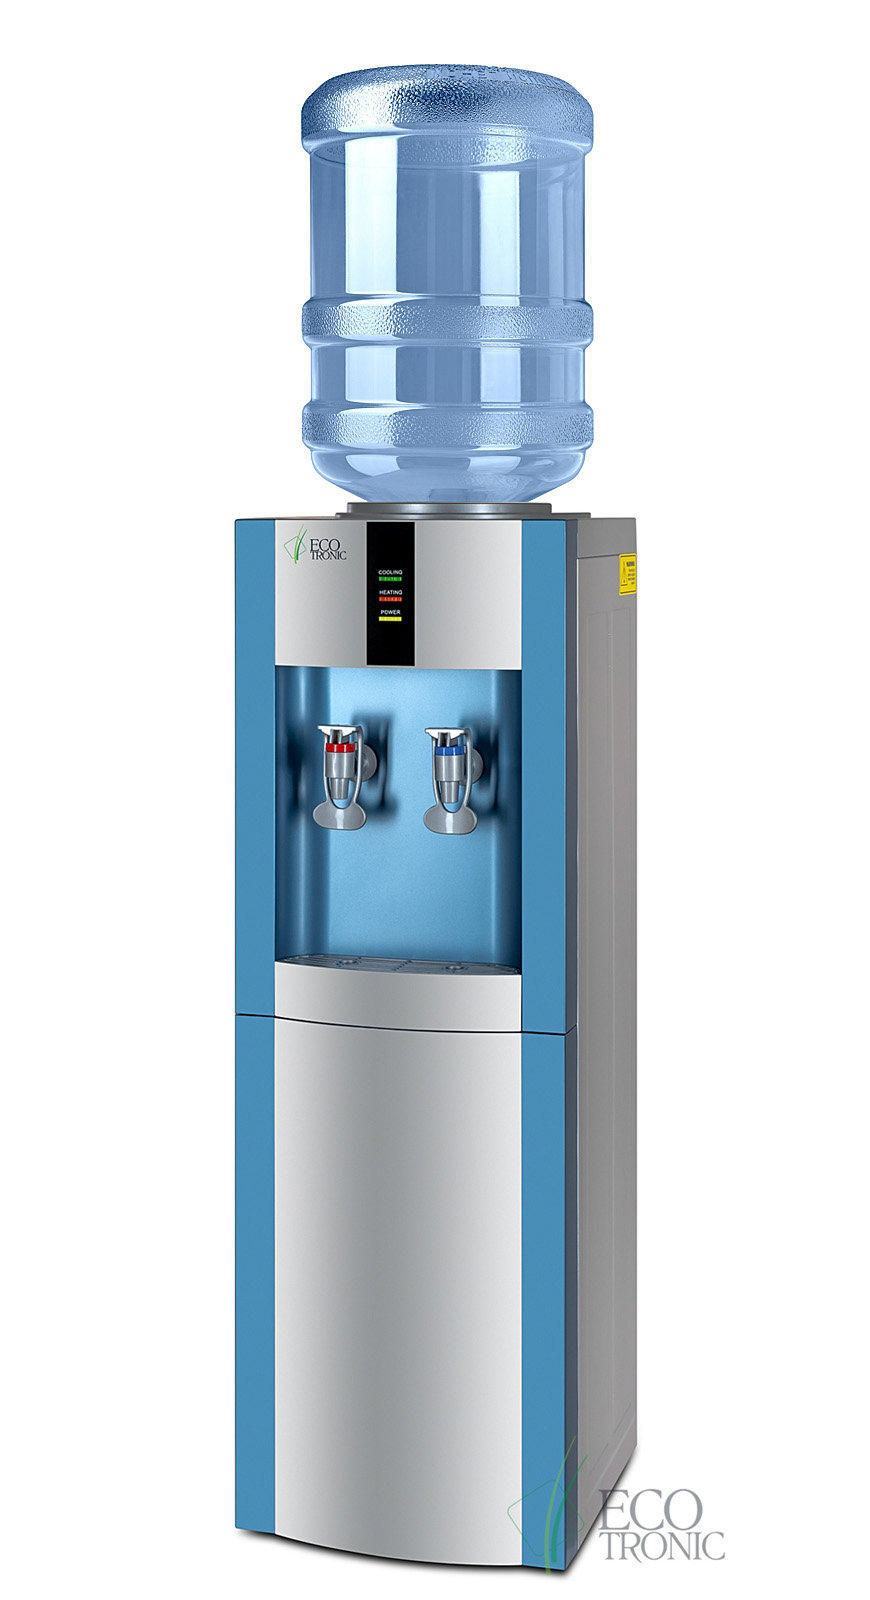 Кулер для воды Ecotronic H1-LE v.2 напольный